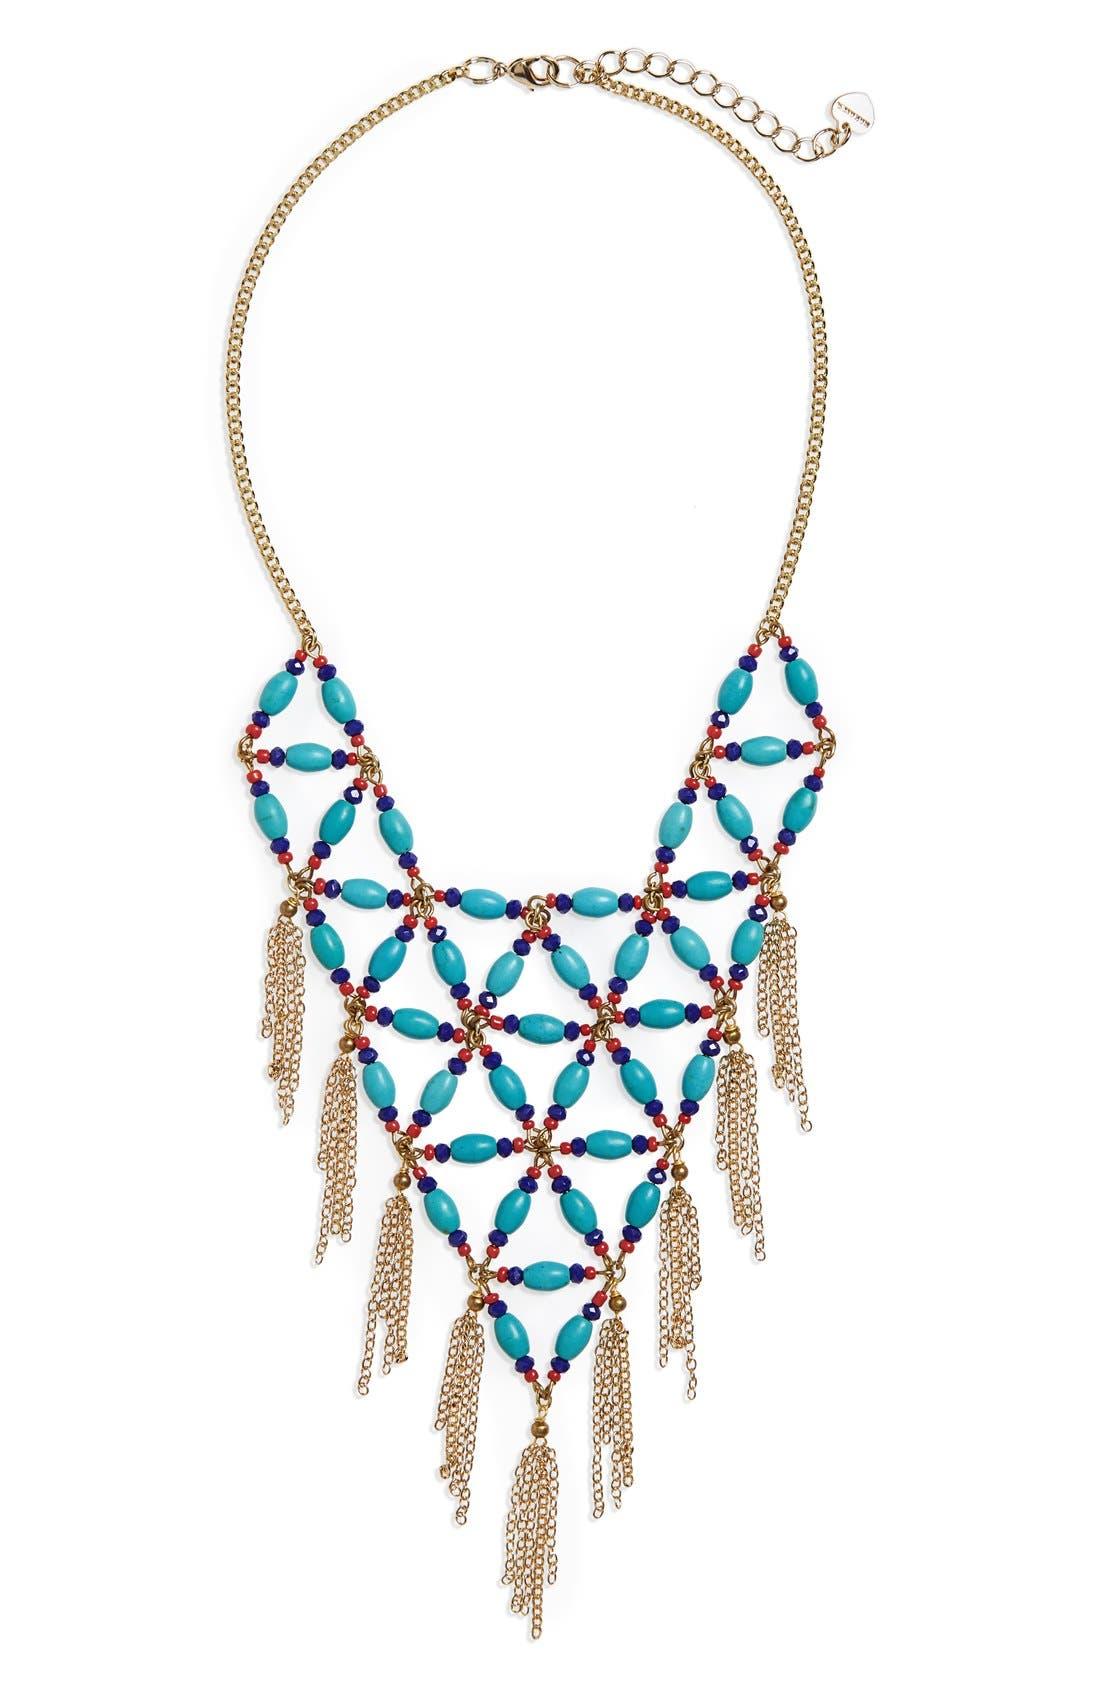 Main Image - Nakamol Design Beaded Statement Necklace